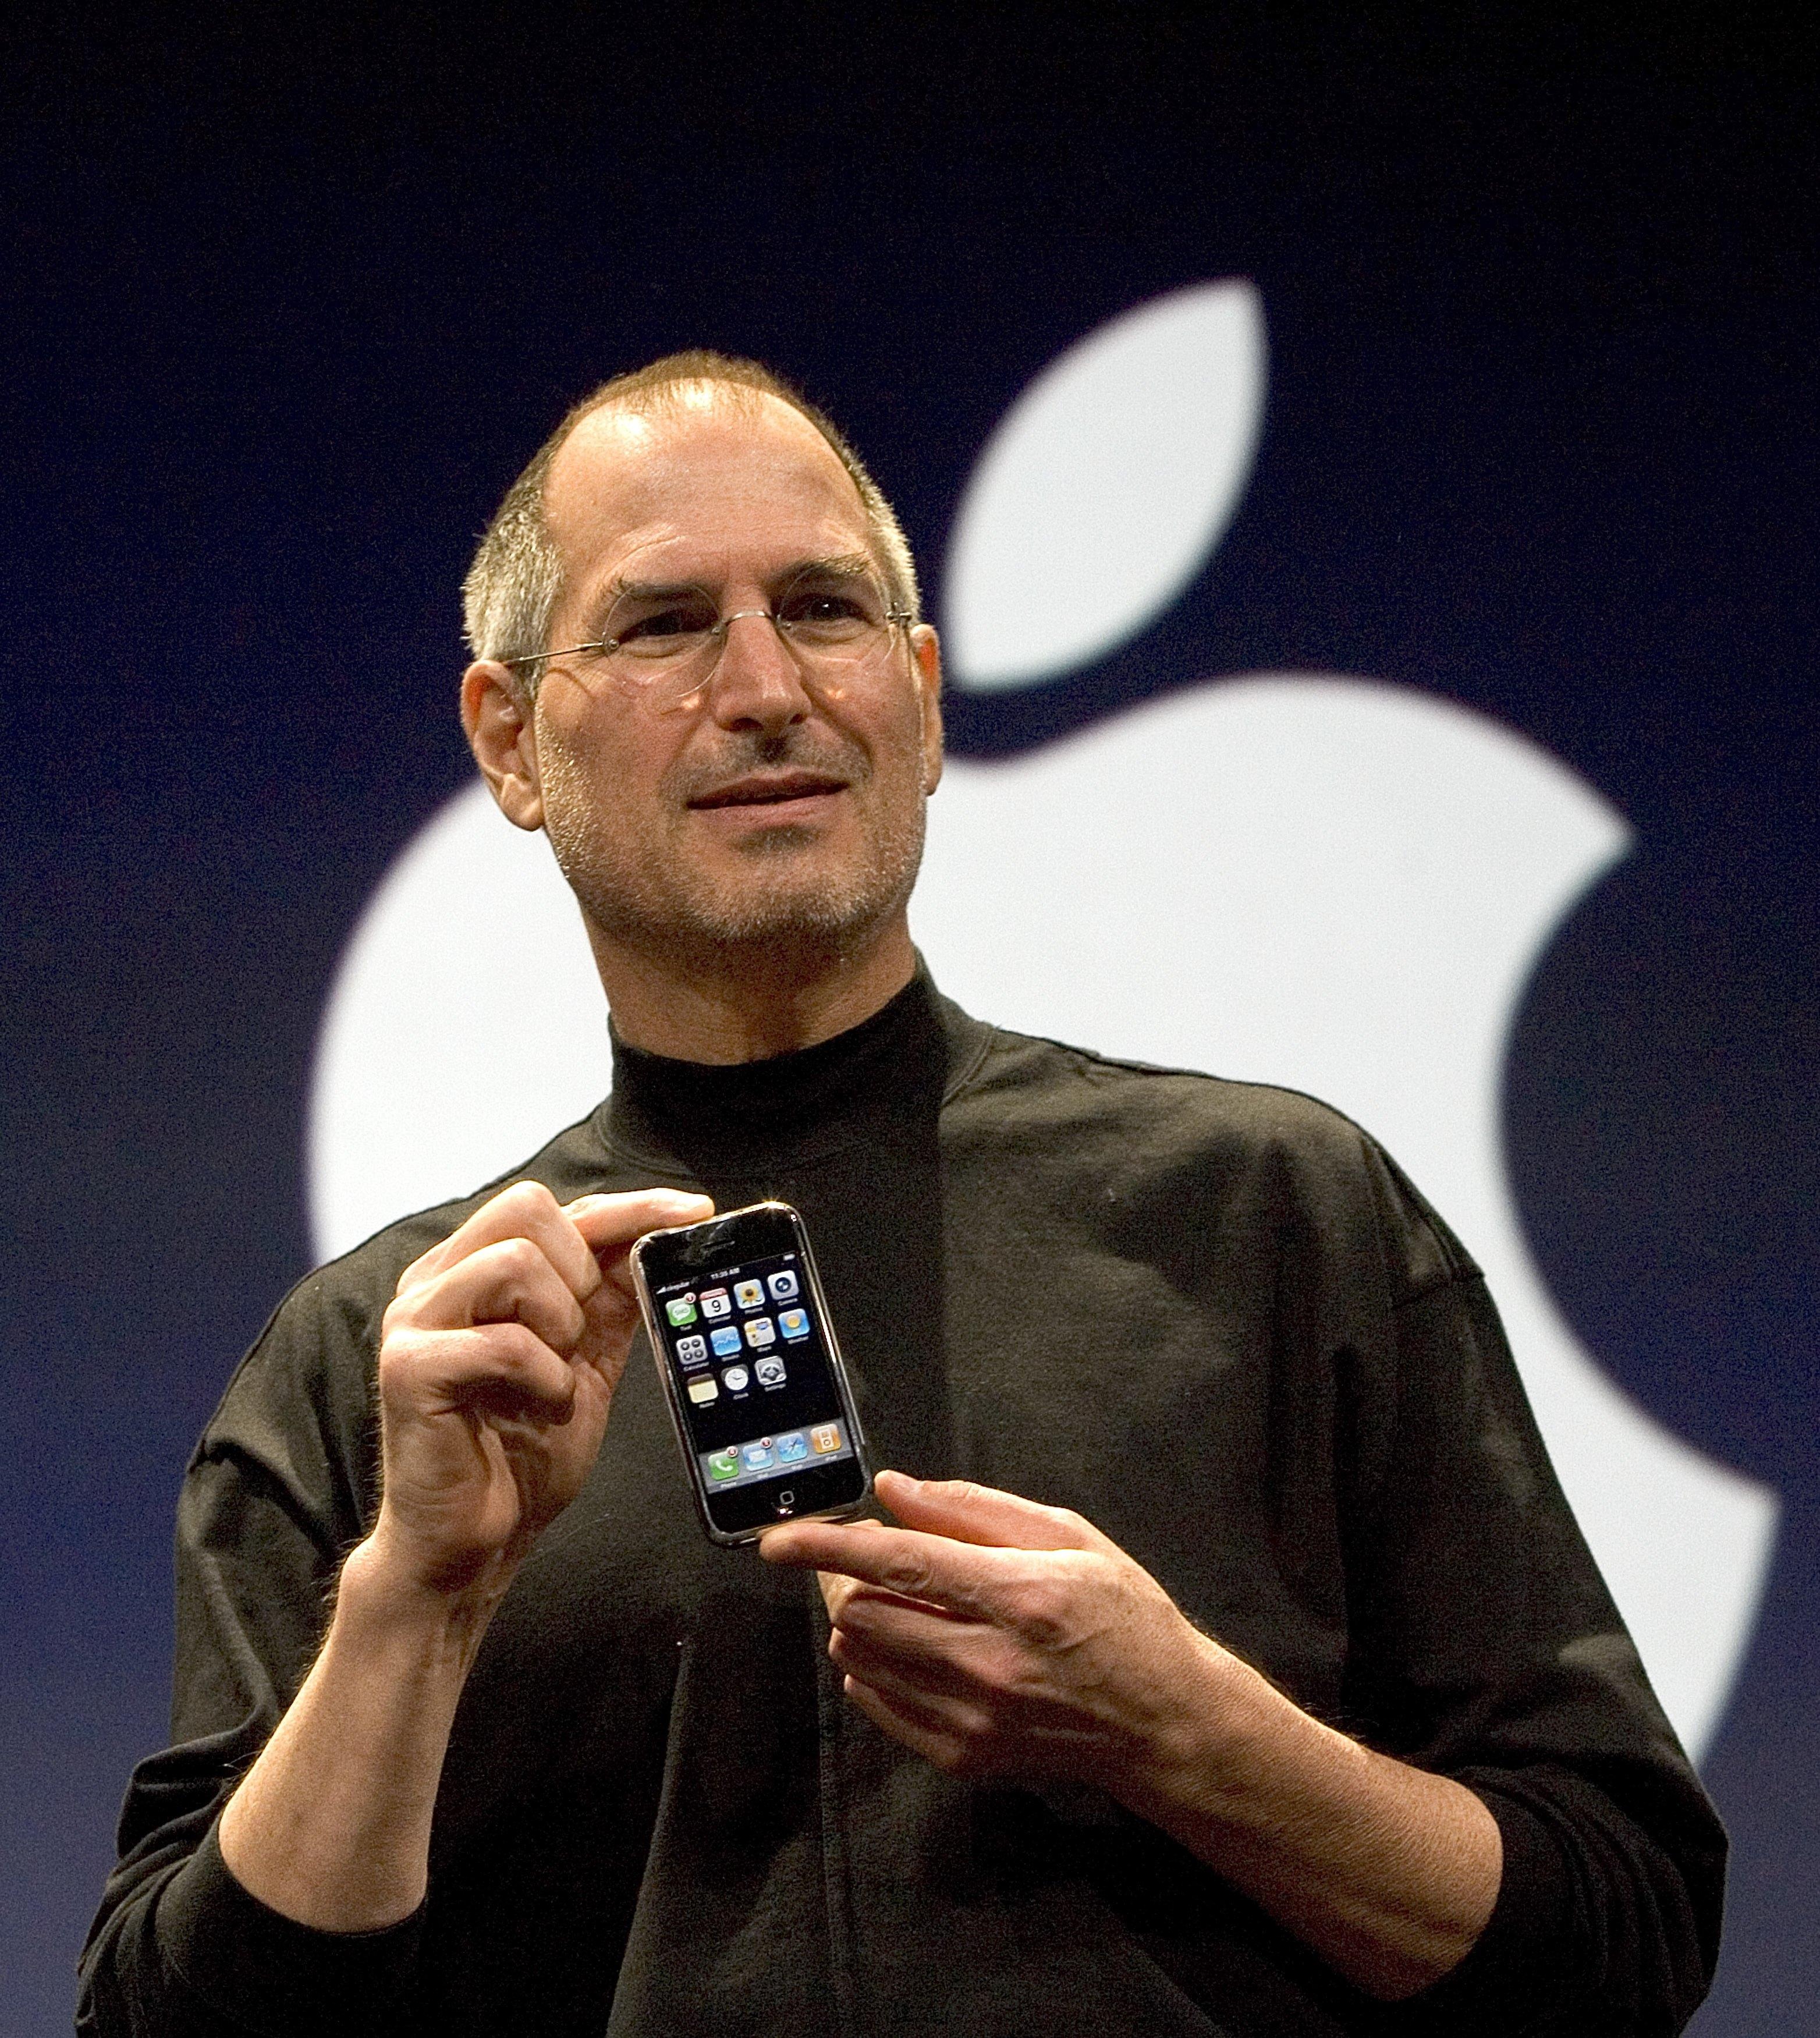 Steve Jobs Unveils Apple iPhone At MacWorld Expo